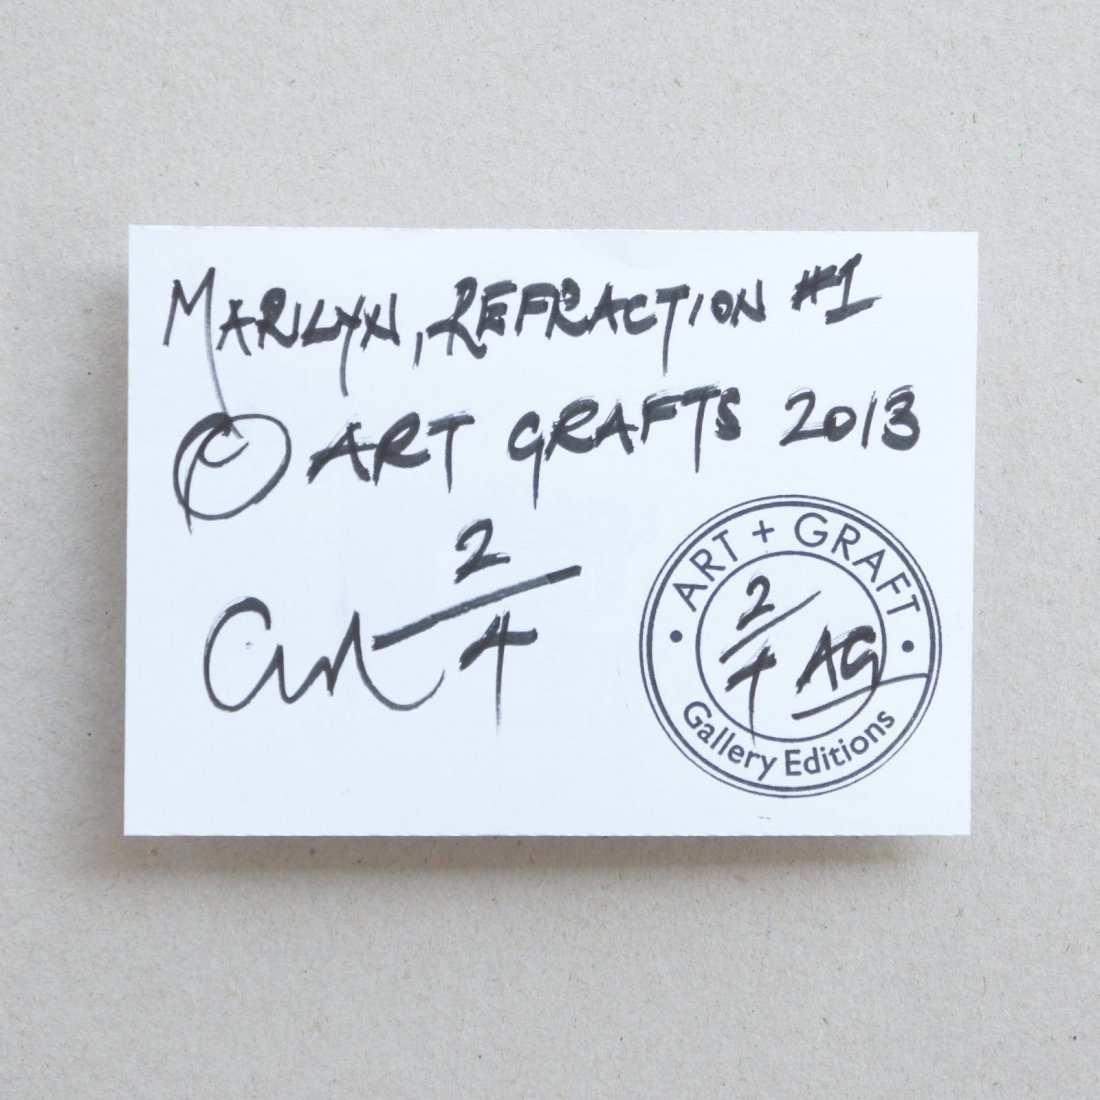 ART GRAFTS Print Marilyn, Refraction #1 - 7